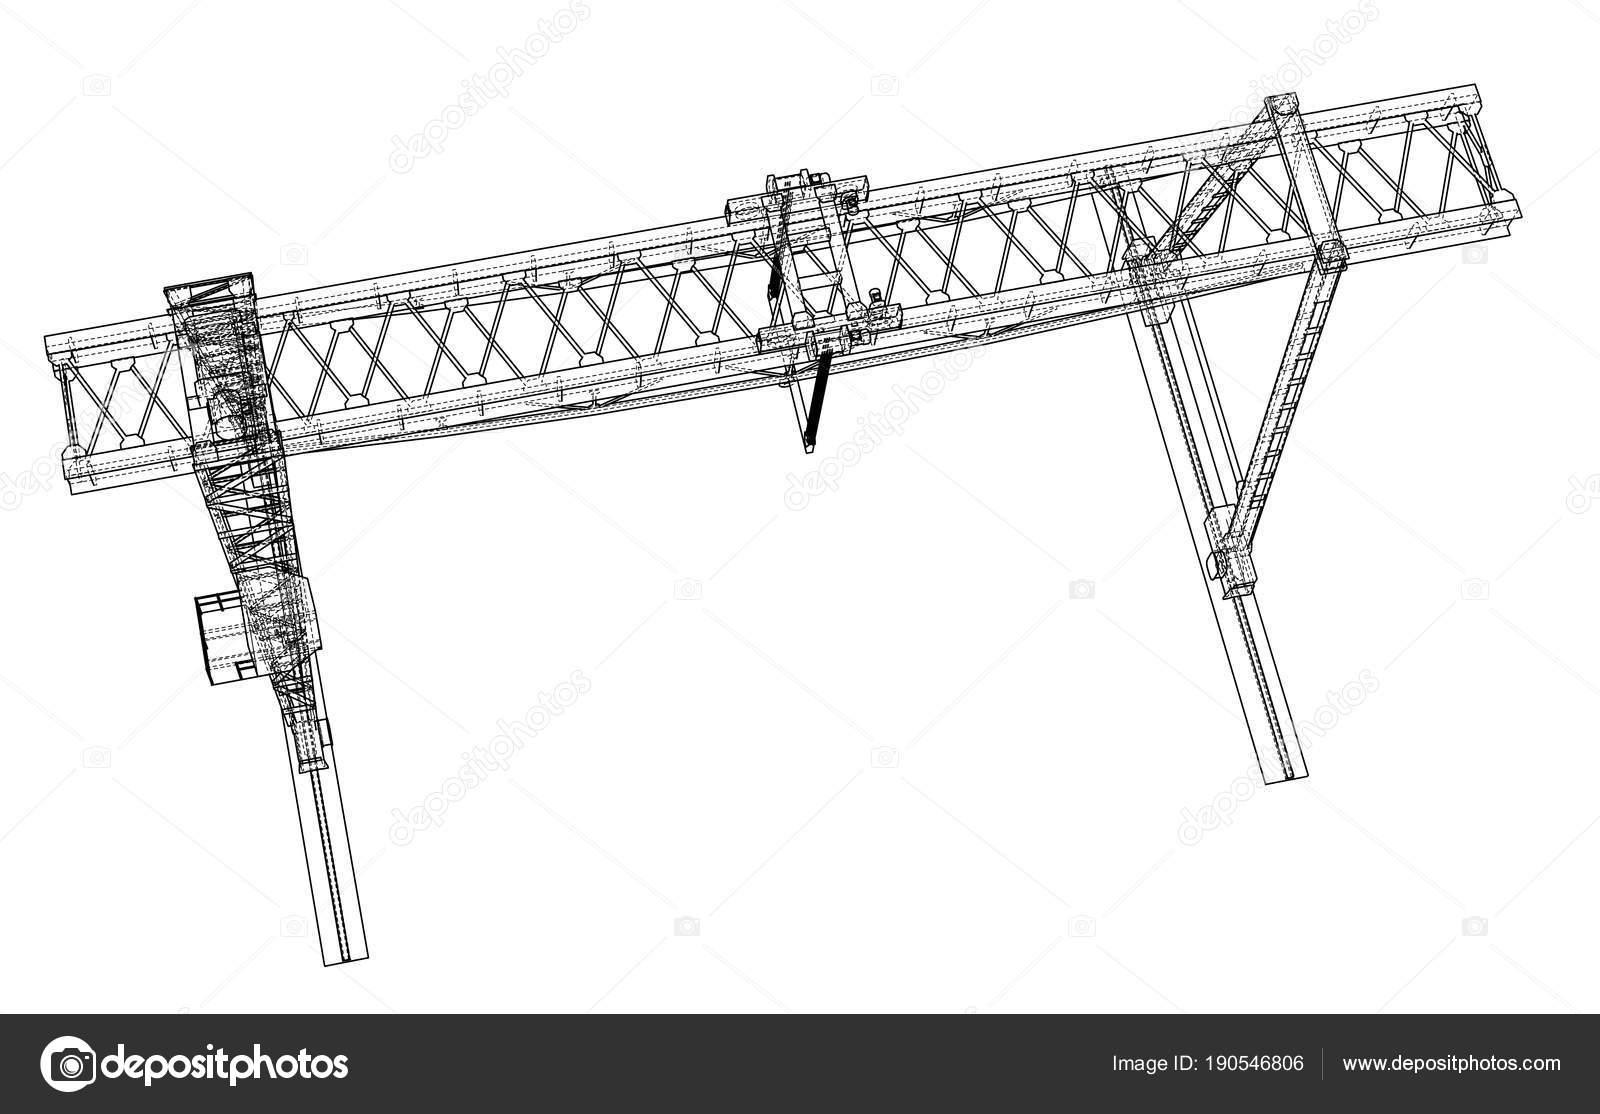 Gantry crane blueprint — Stock Photo © cherezoff #190546806